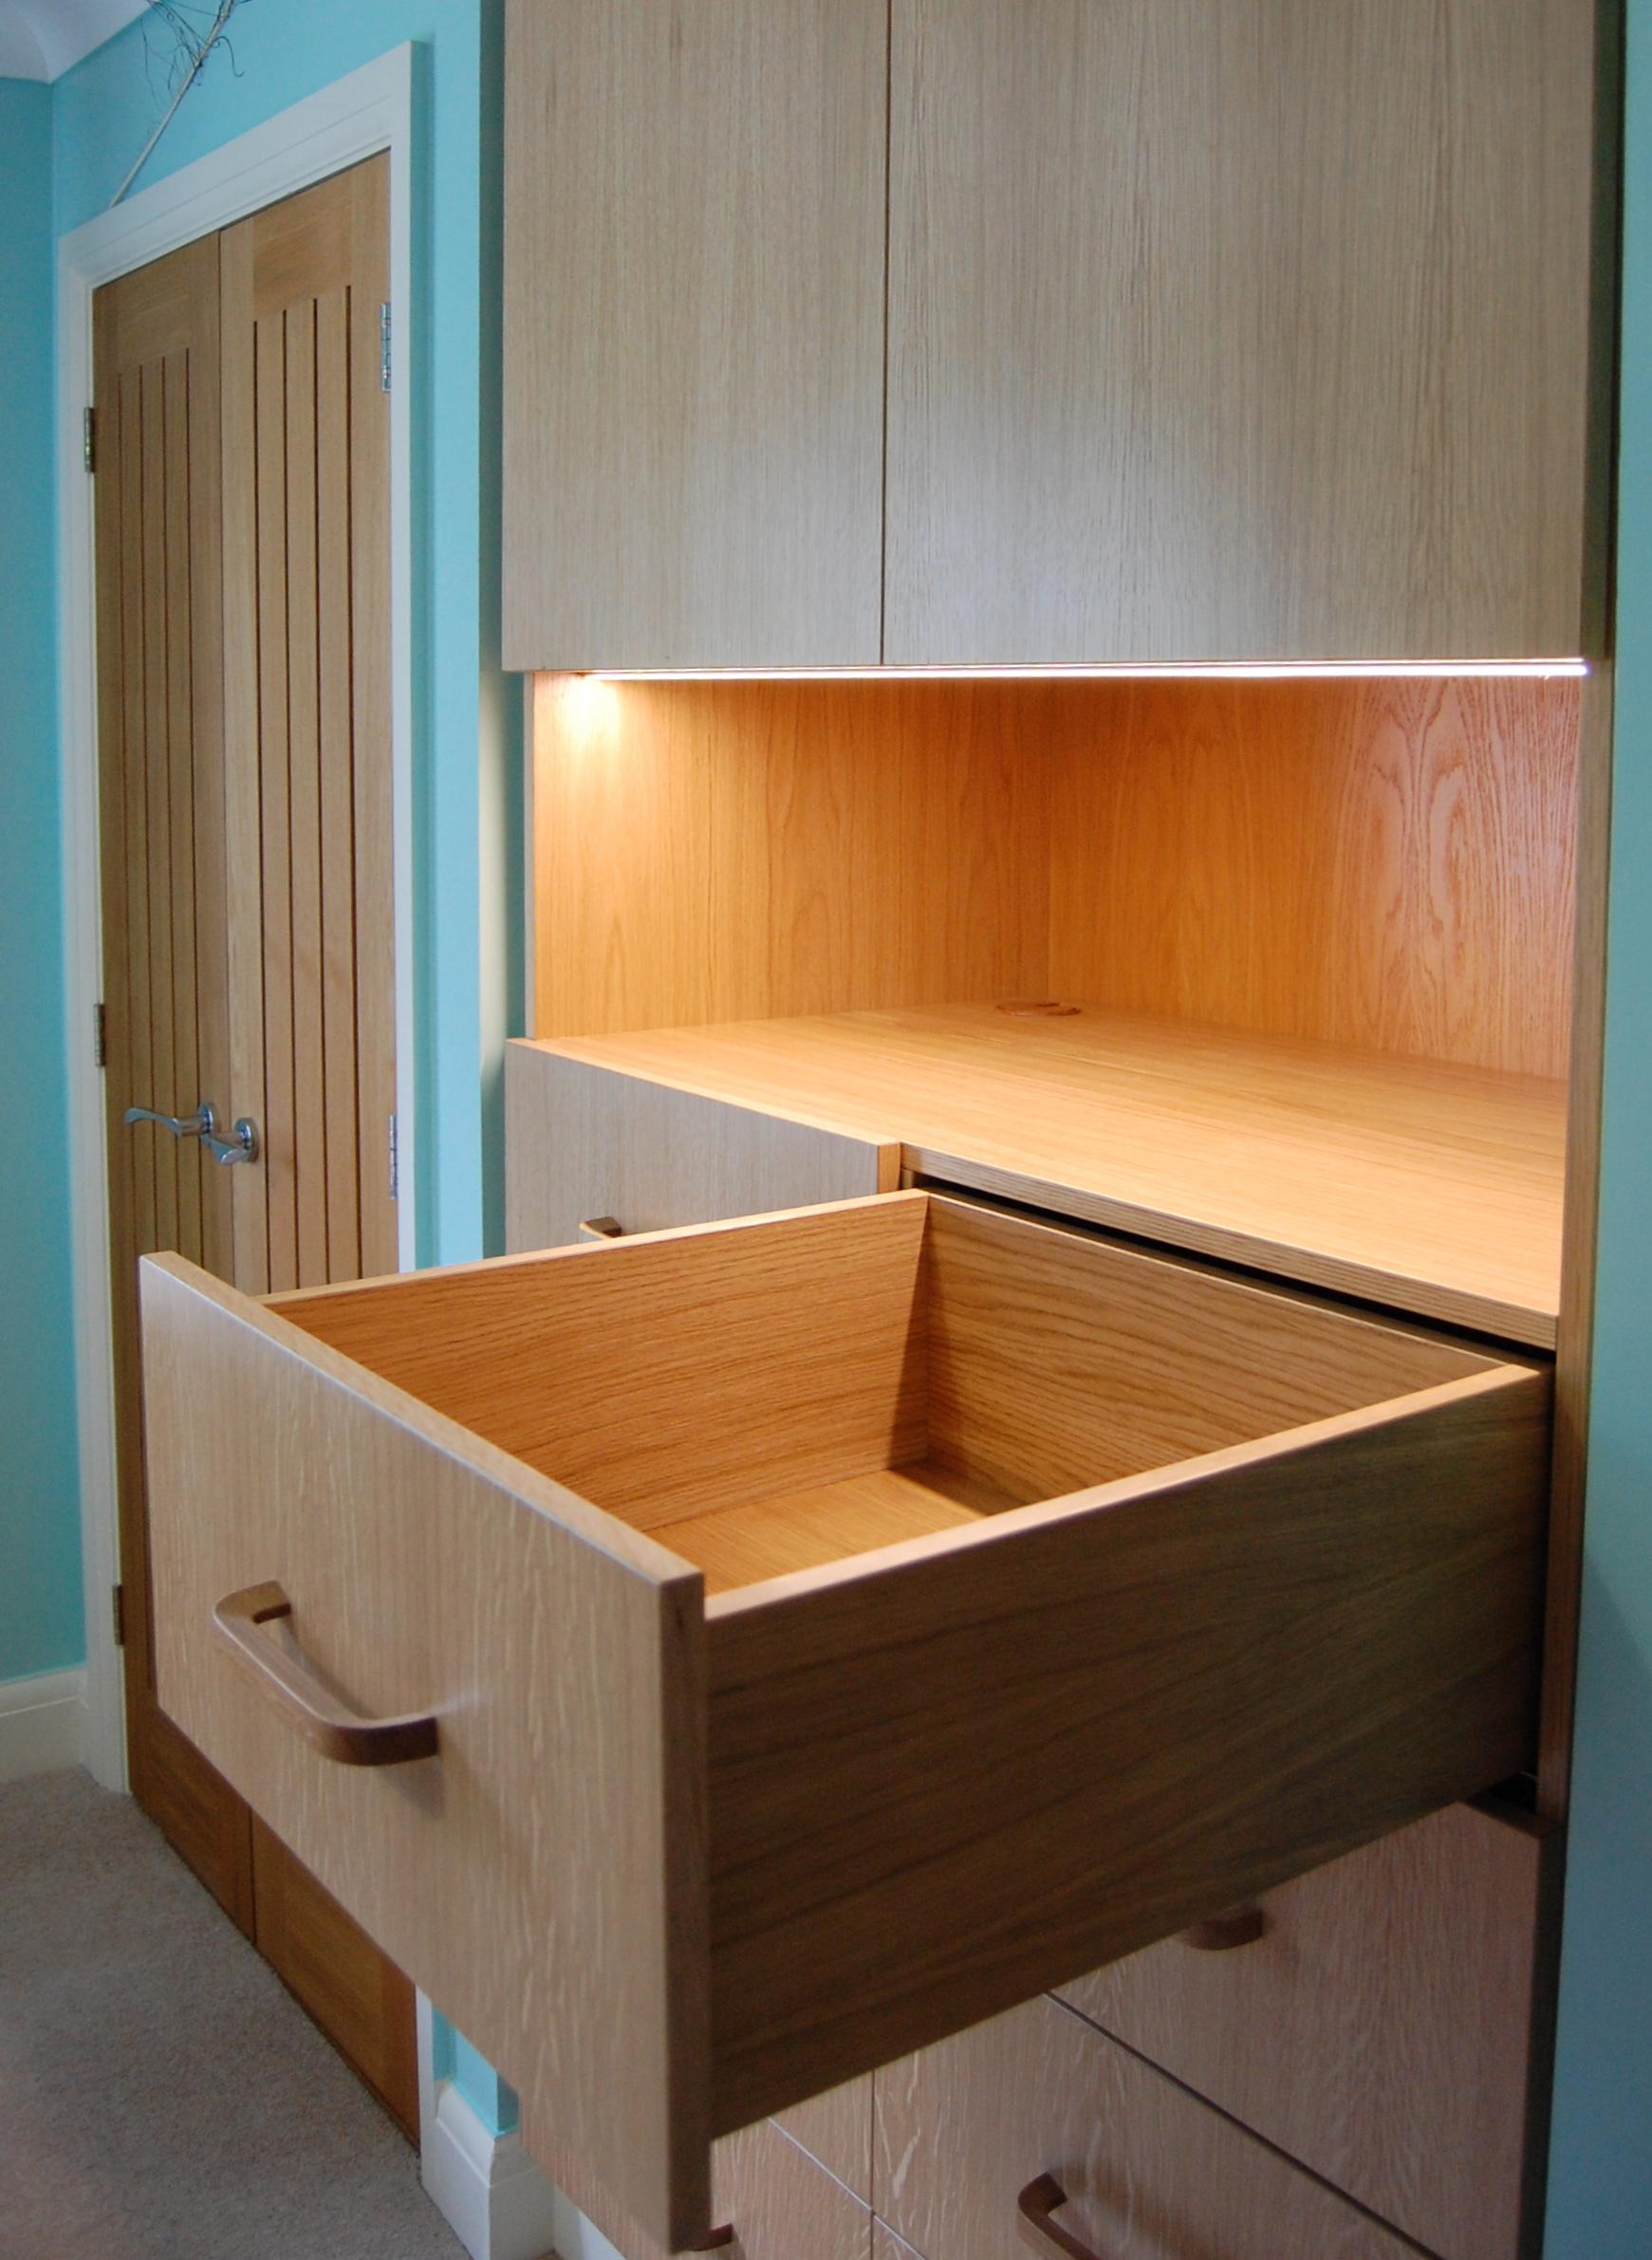 Grain_Bespoke_Furniture_Drawers_2.jpg